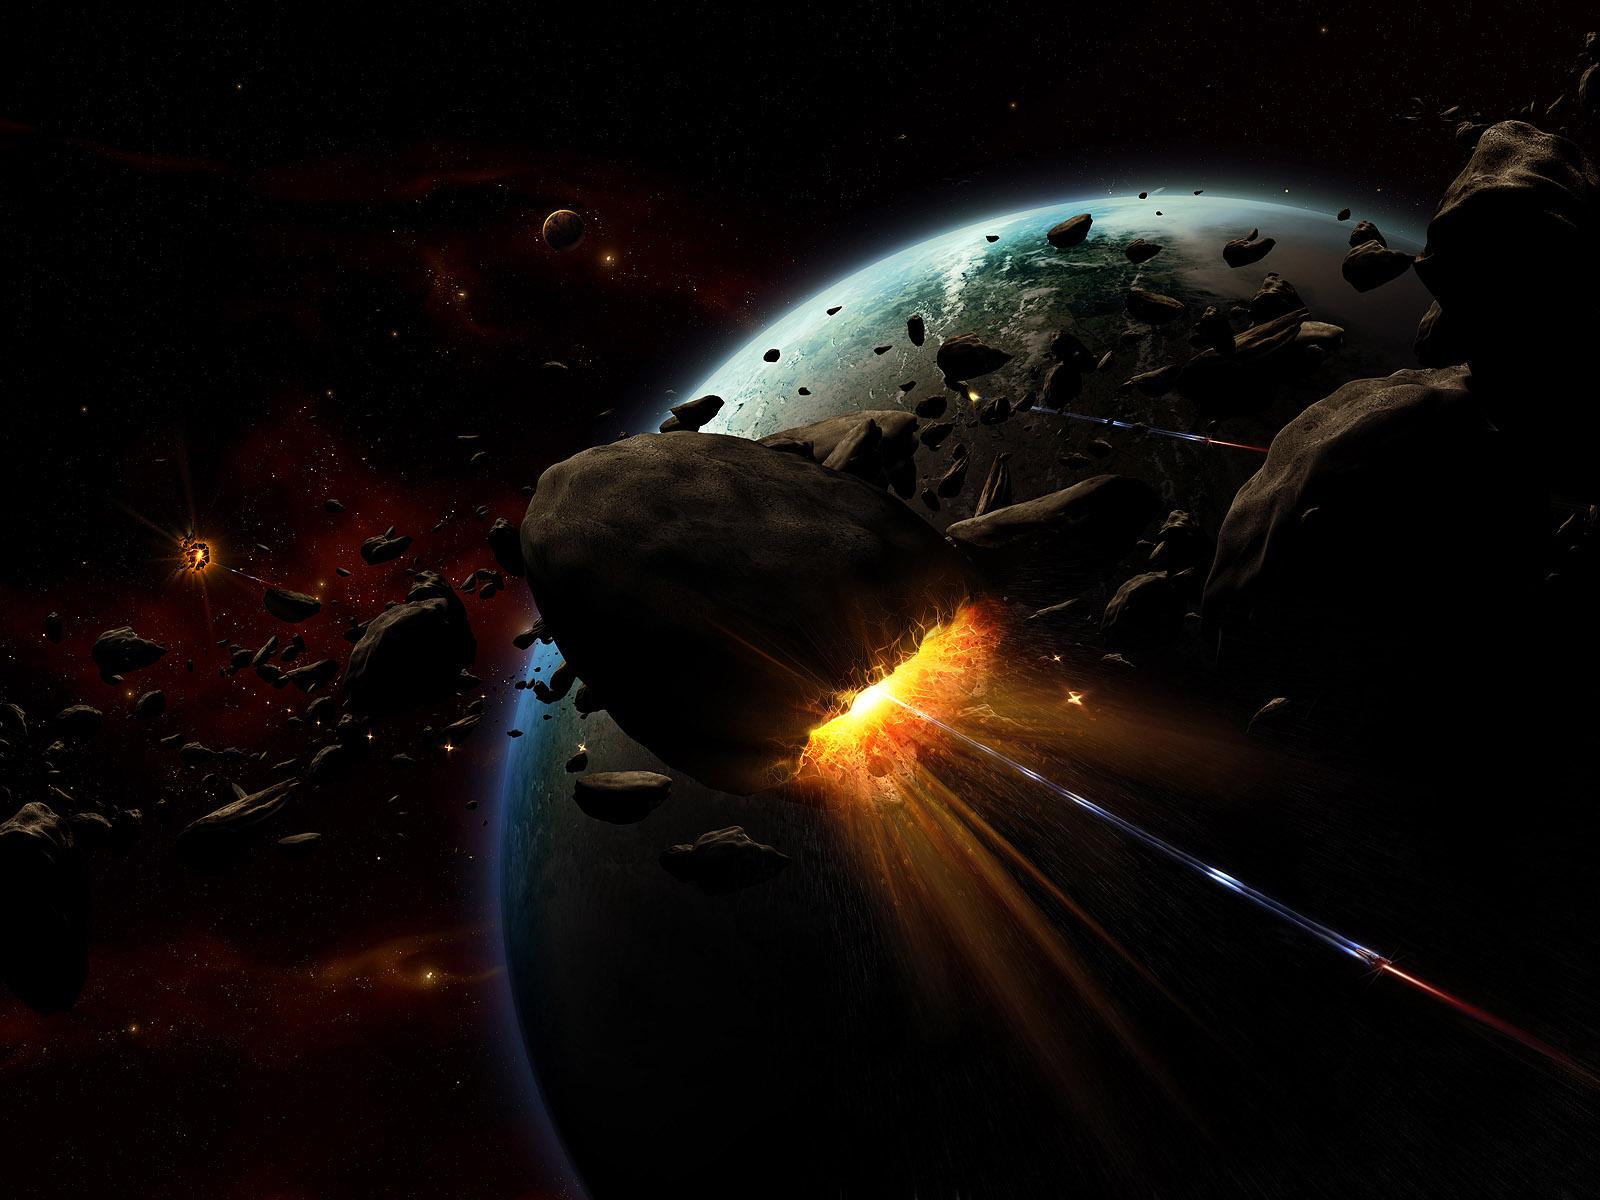 Обои Explosion, взрыв, space, Meteorite, метеорит. Космос foto 7